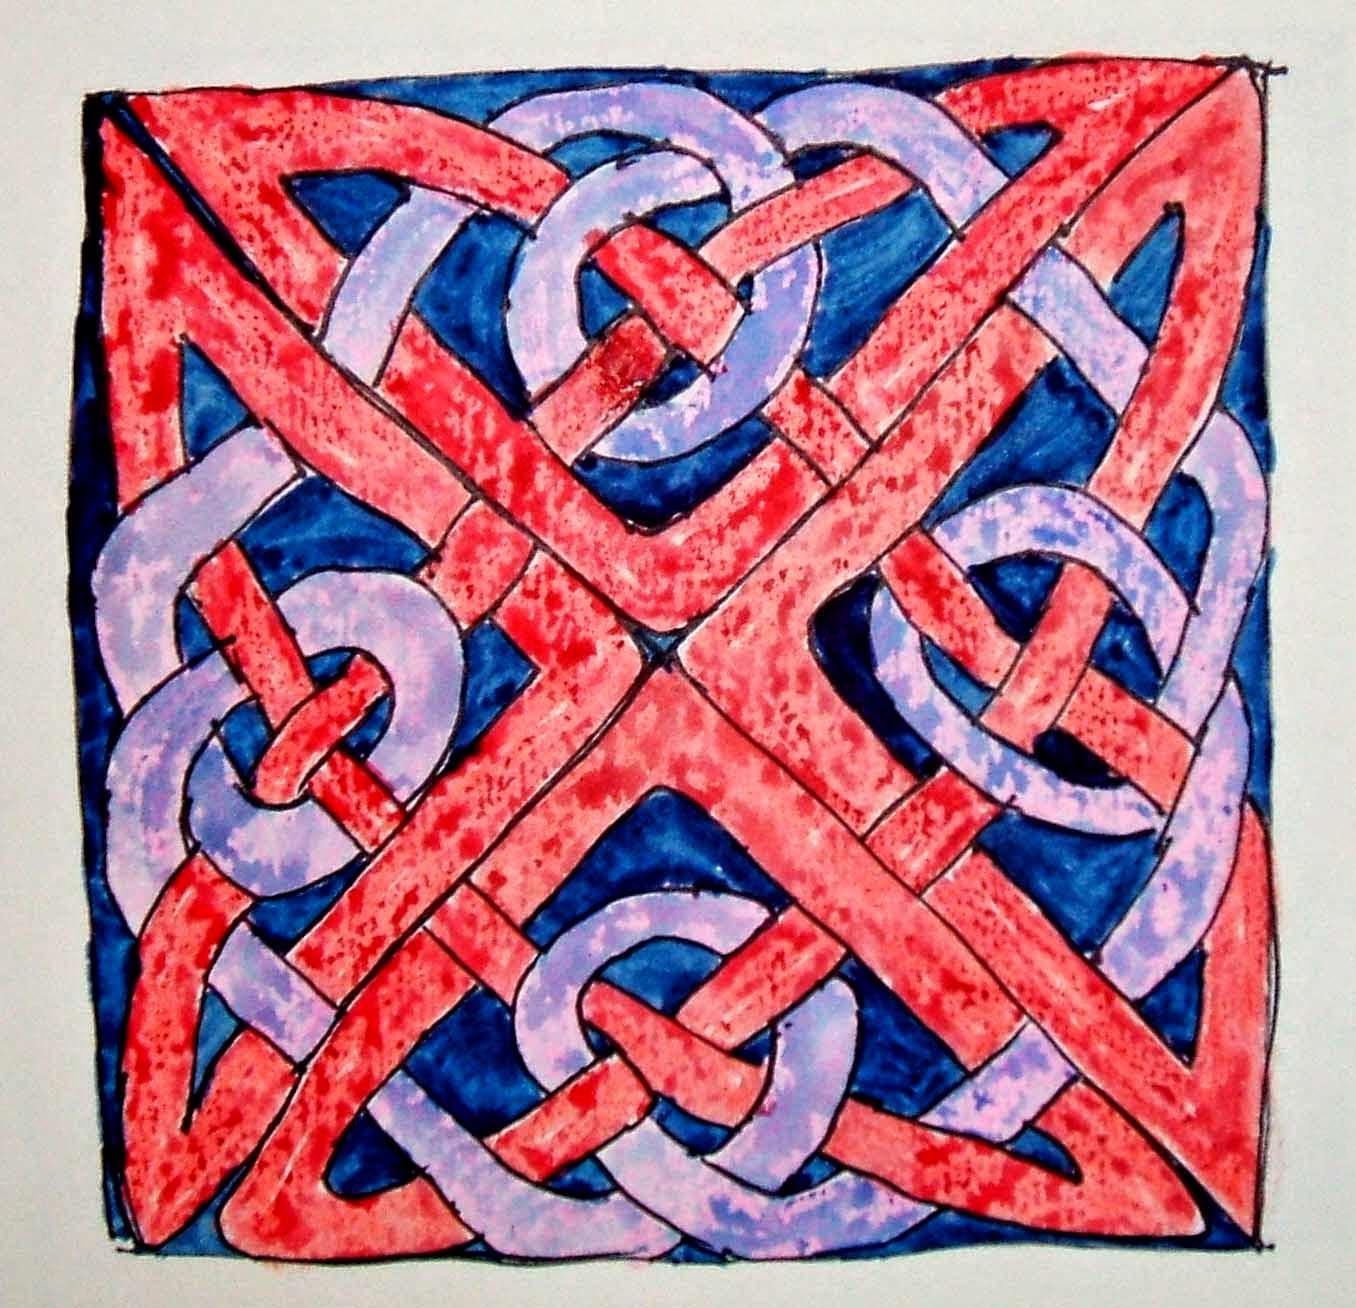 Anglo Saxon knotwork at Britford, Wiltshire